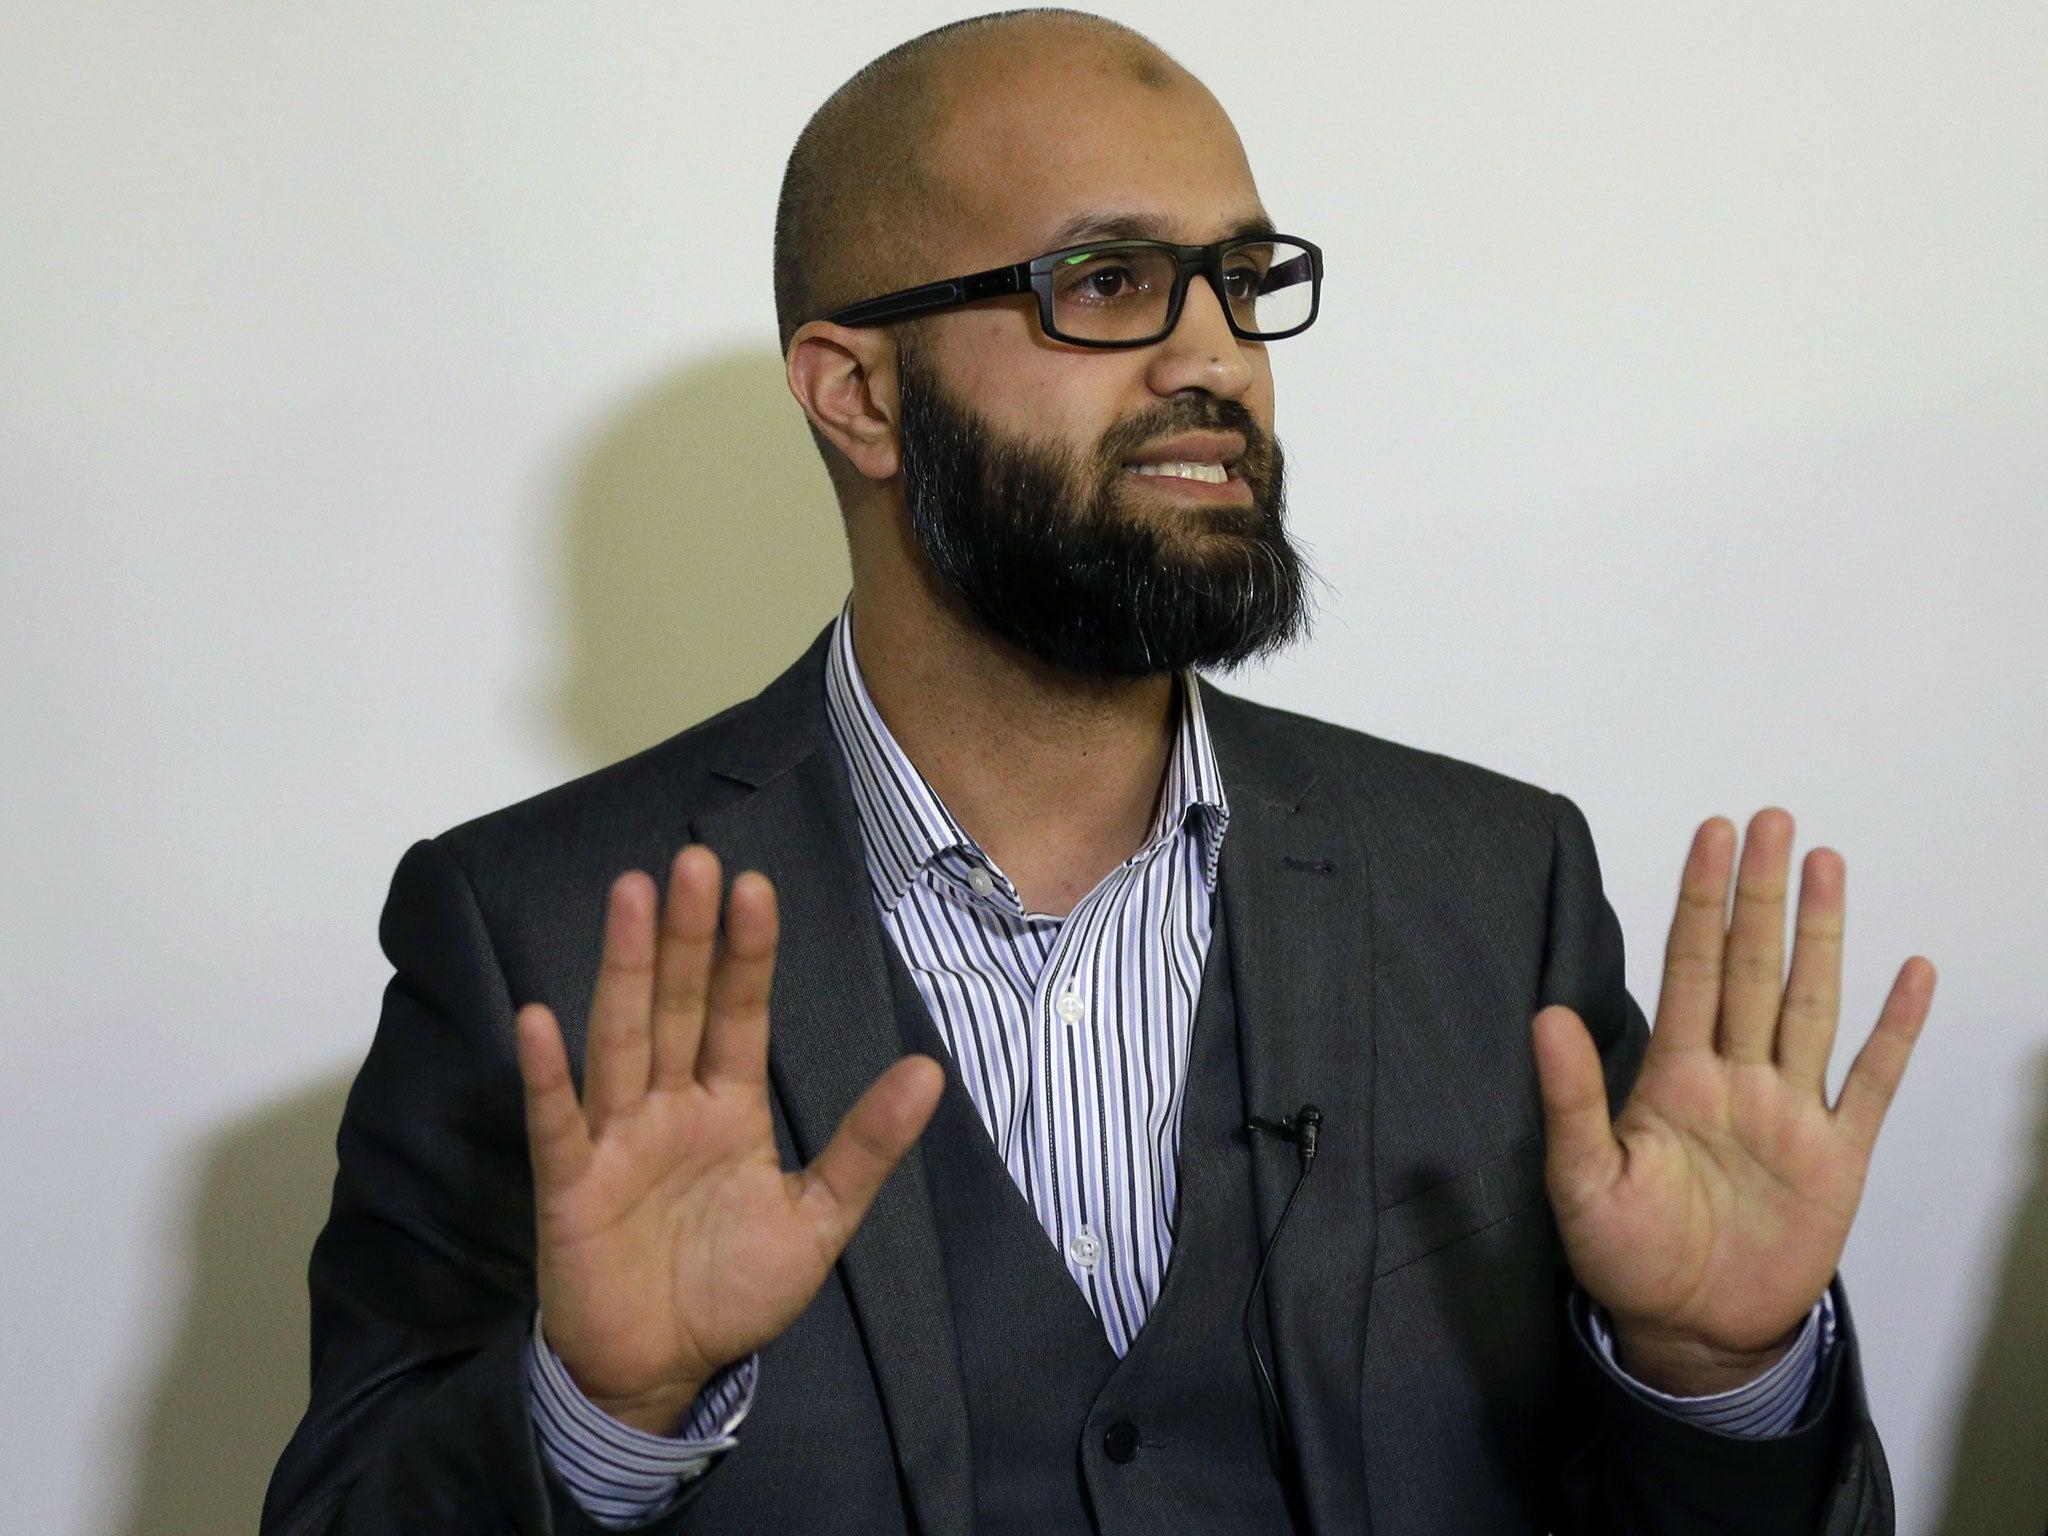 Jihadi John': Mohammed Emwazi was 'extremely kind, gentle